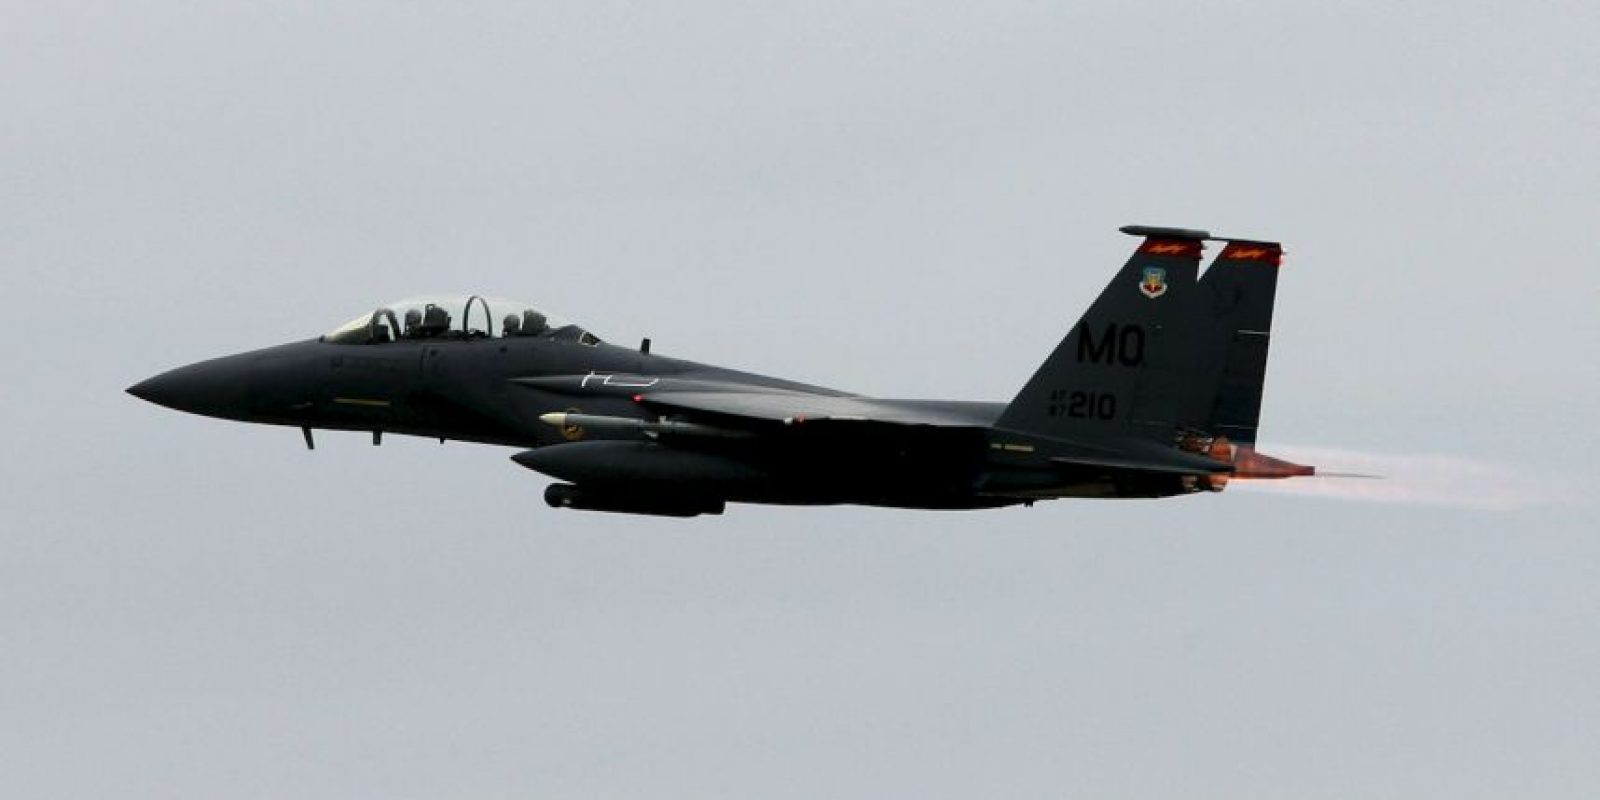 3. F-15E Strike Eagle. Velocidad máxima de Mach 2,5 (3.062,6 km/h) Foto:Wikimedia